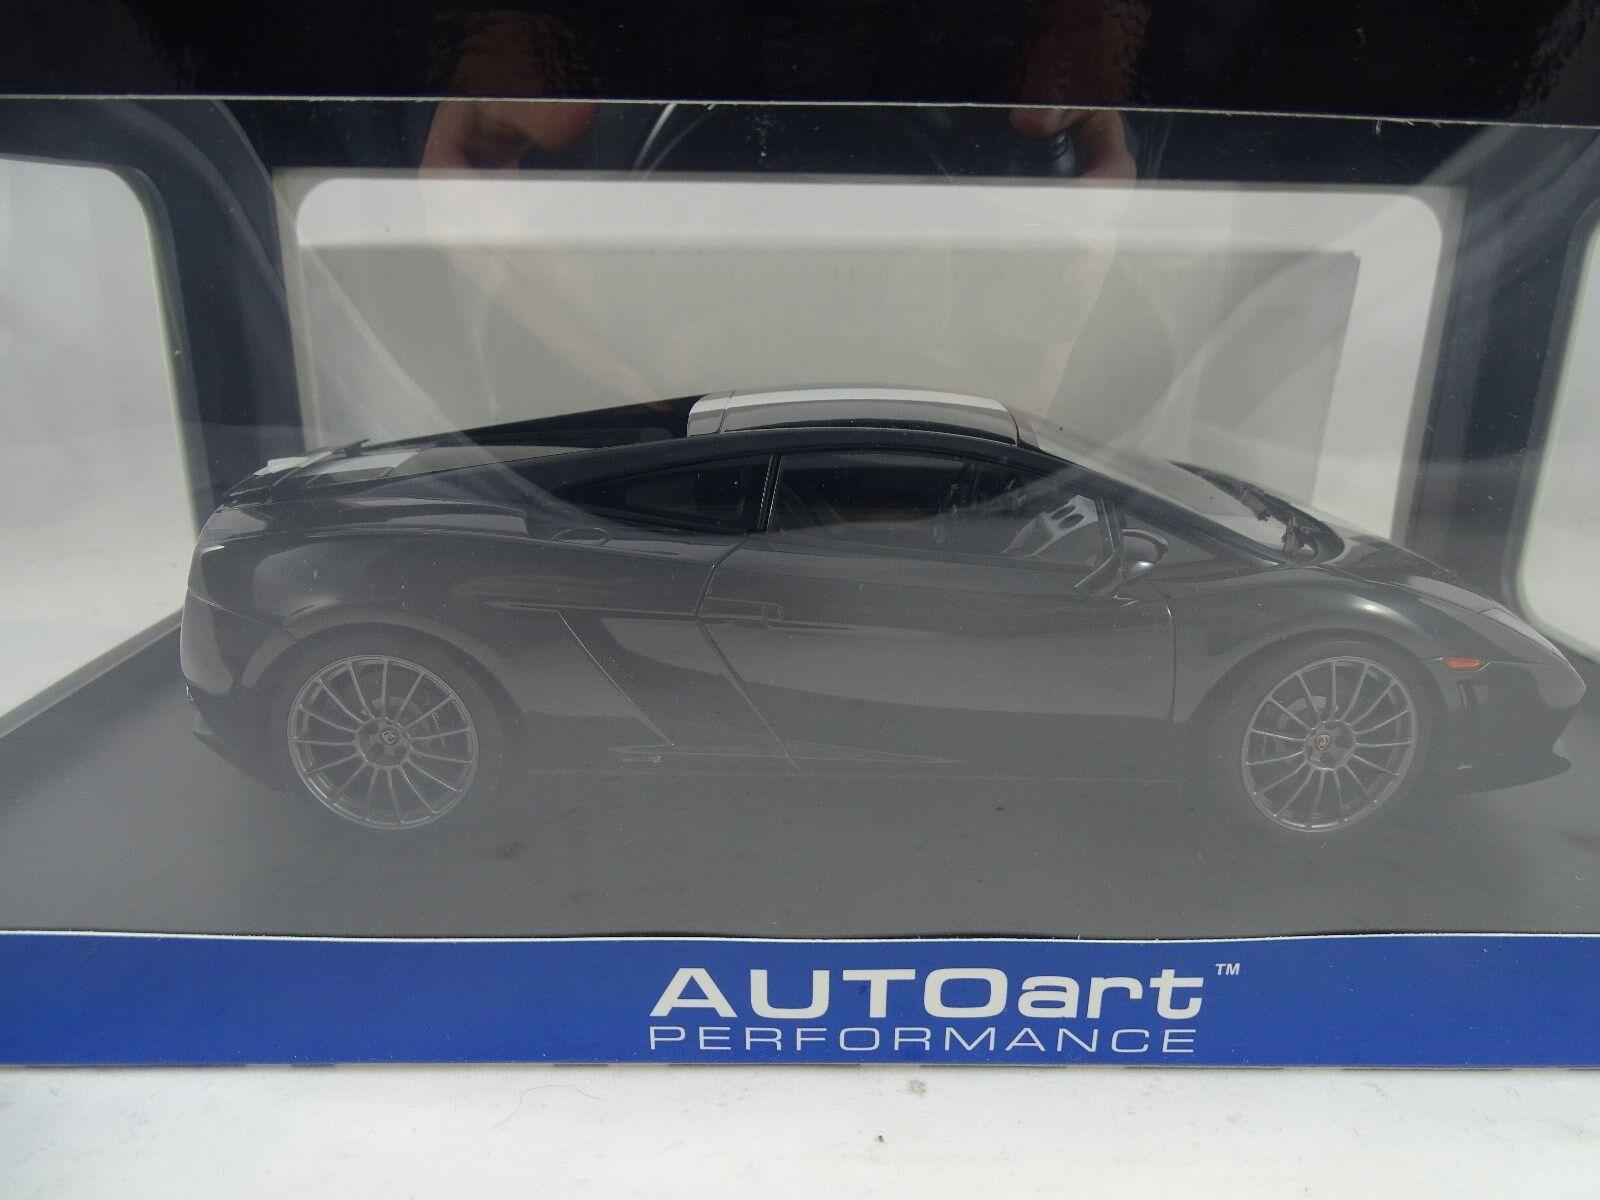 Autoart 74631 Lamborghini Gallardo LP550-2 Vb Balboni Ed. Negro Rareza